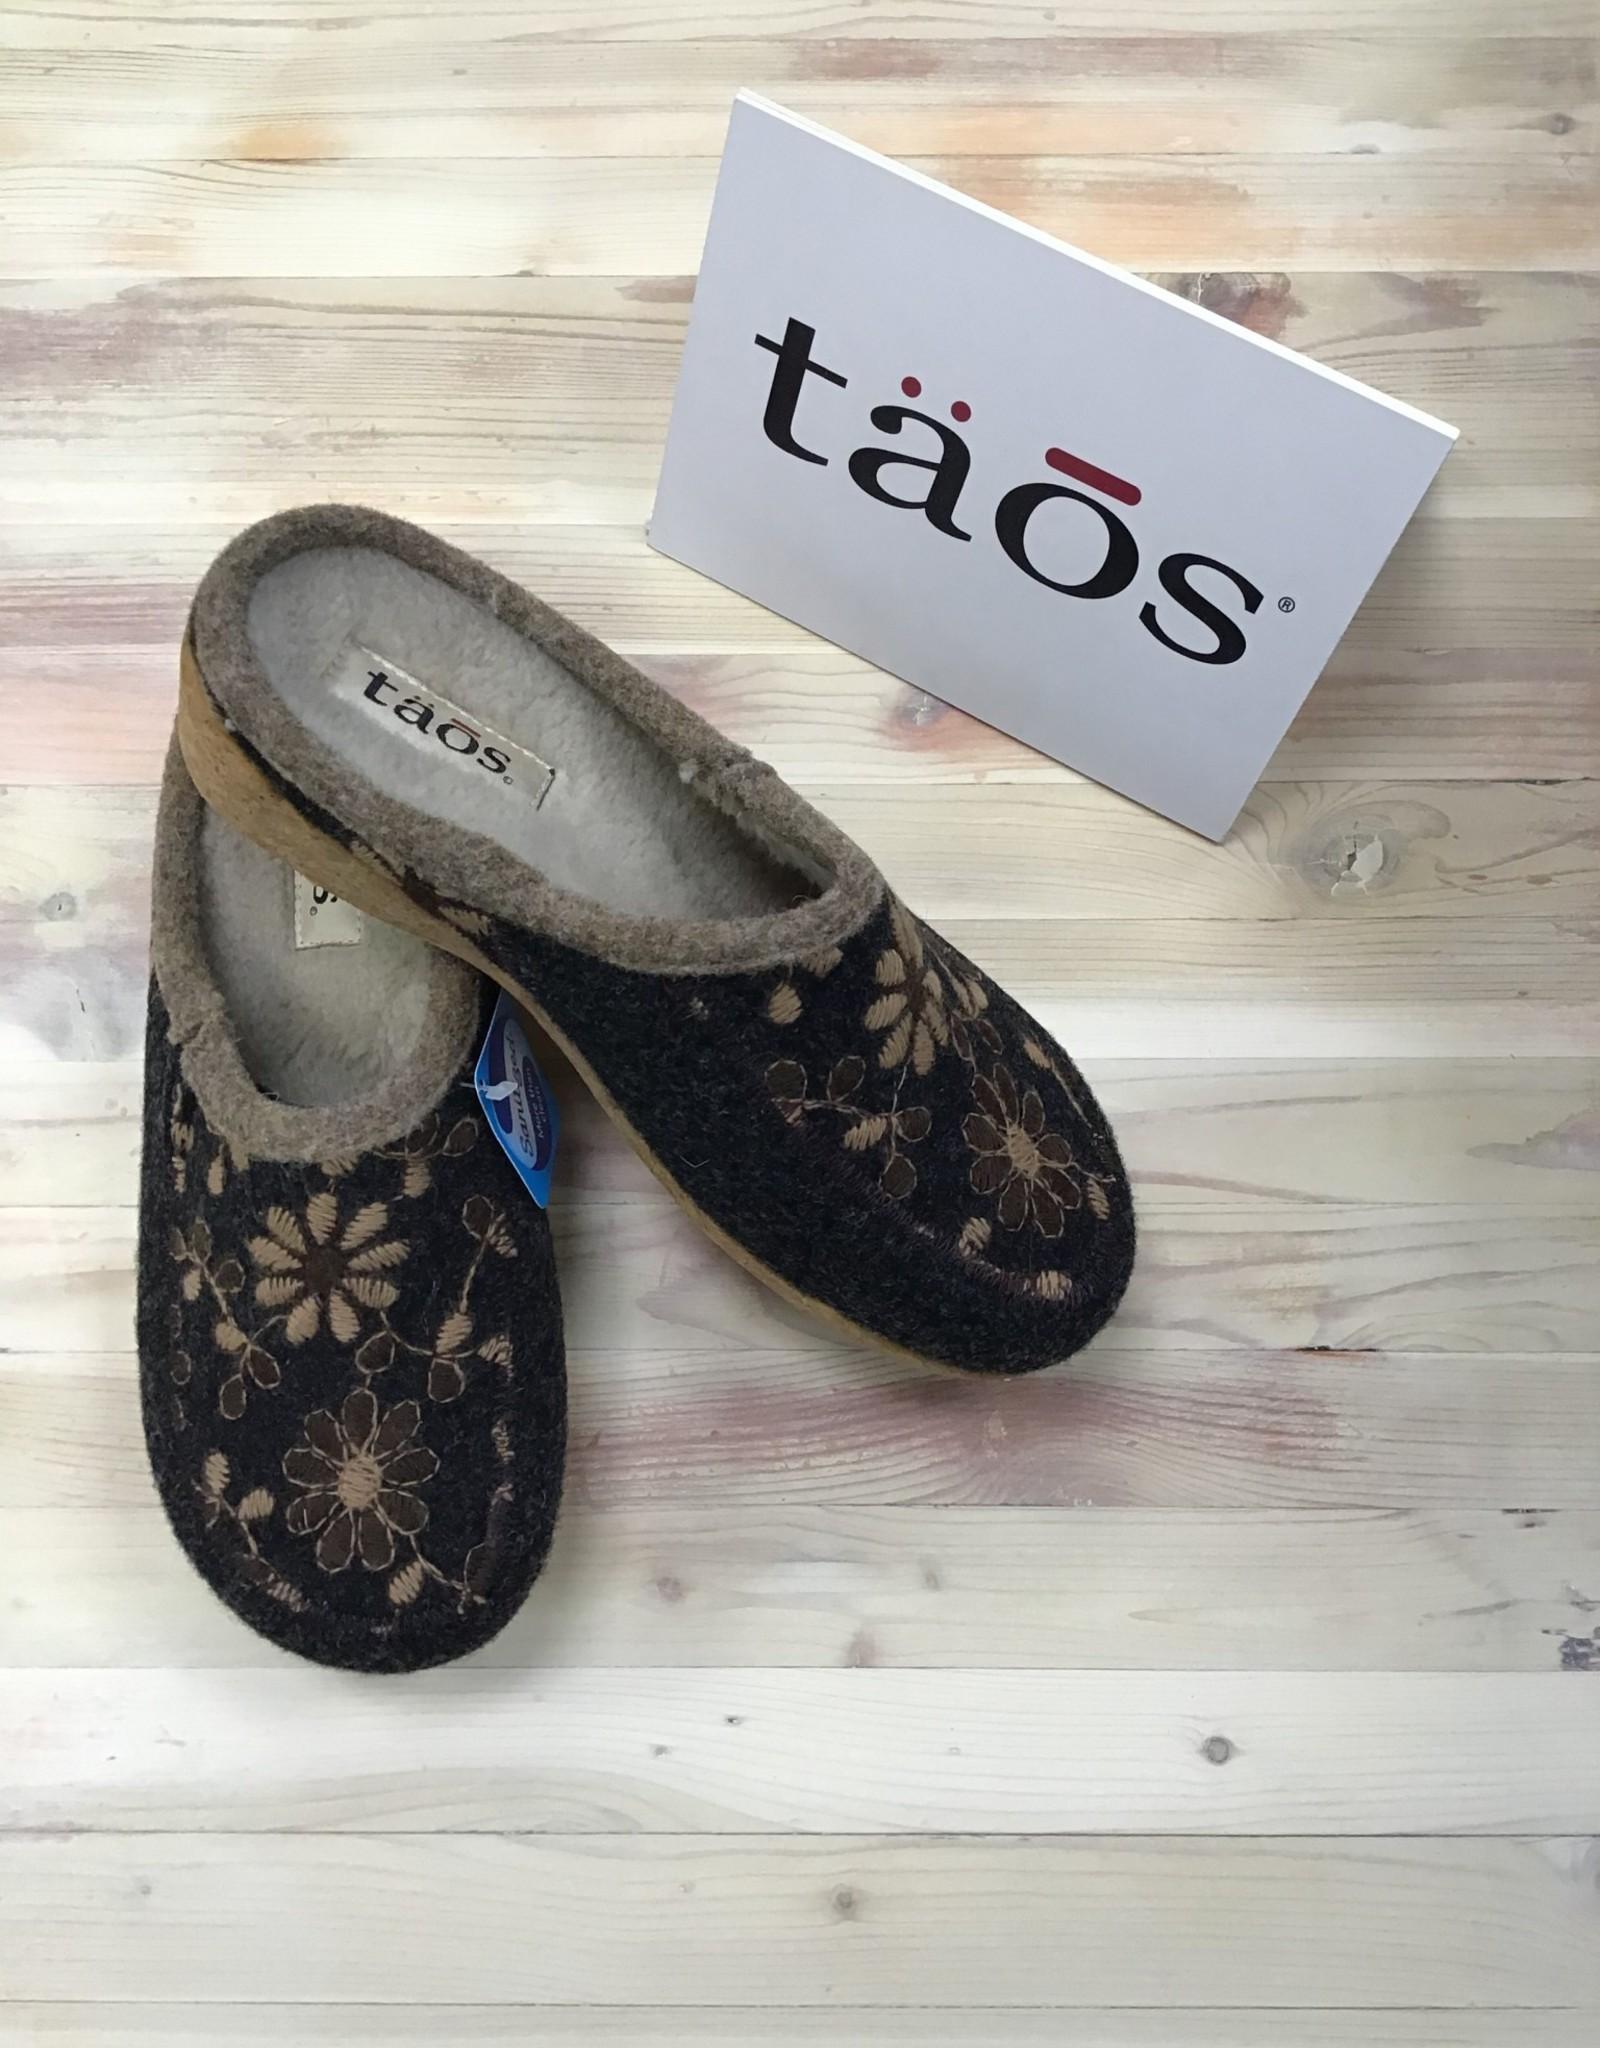 Taos Taos Woolderness 2 Ladies'